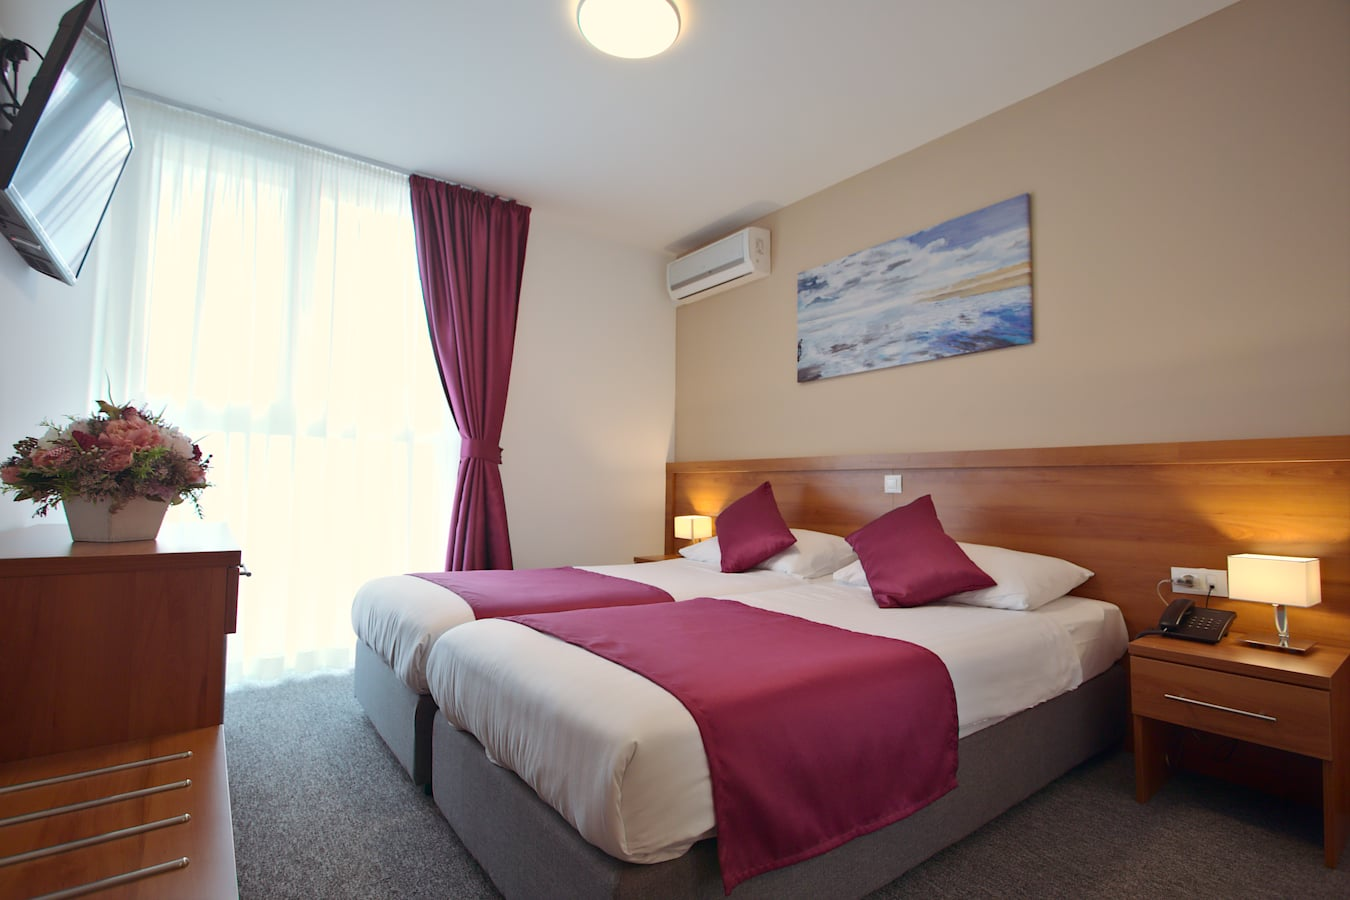 annex-komodor-hotel-double-room-dubrovnik.jpg